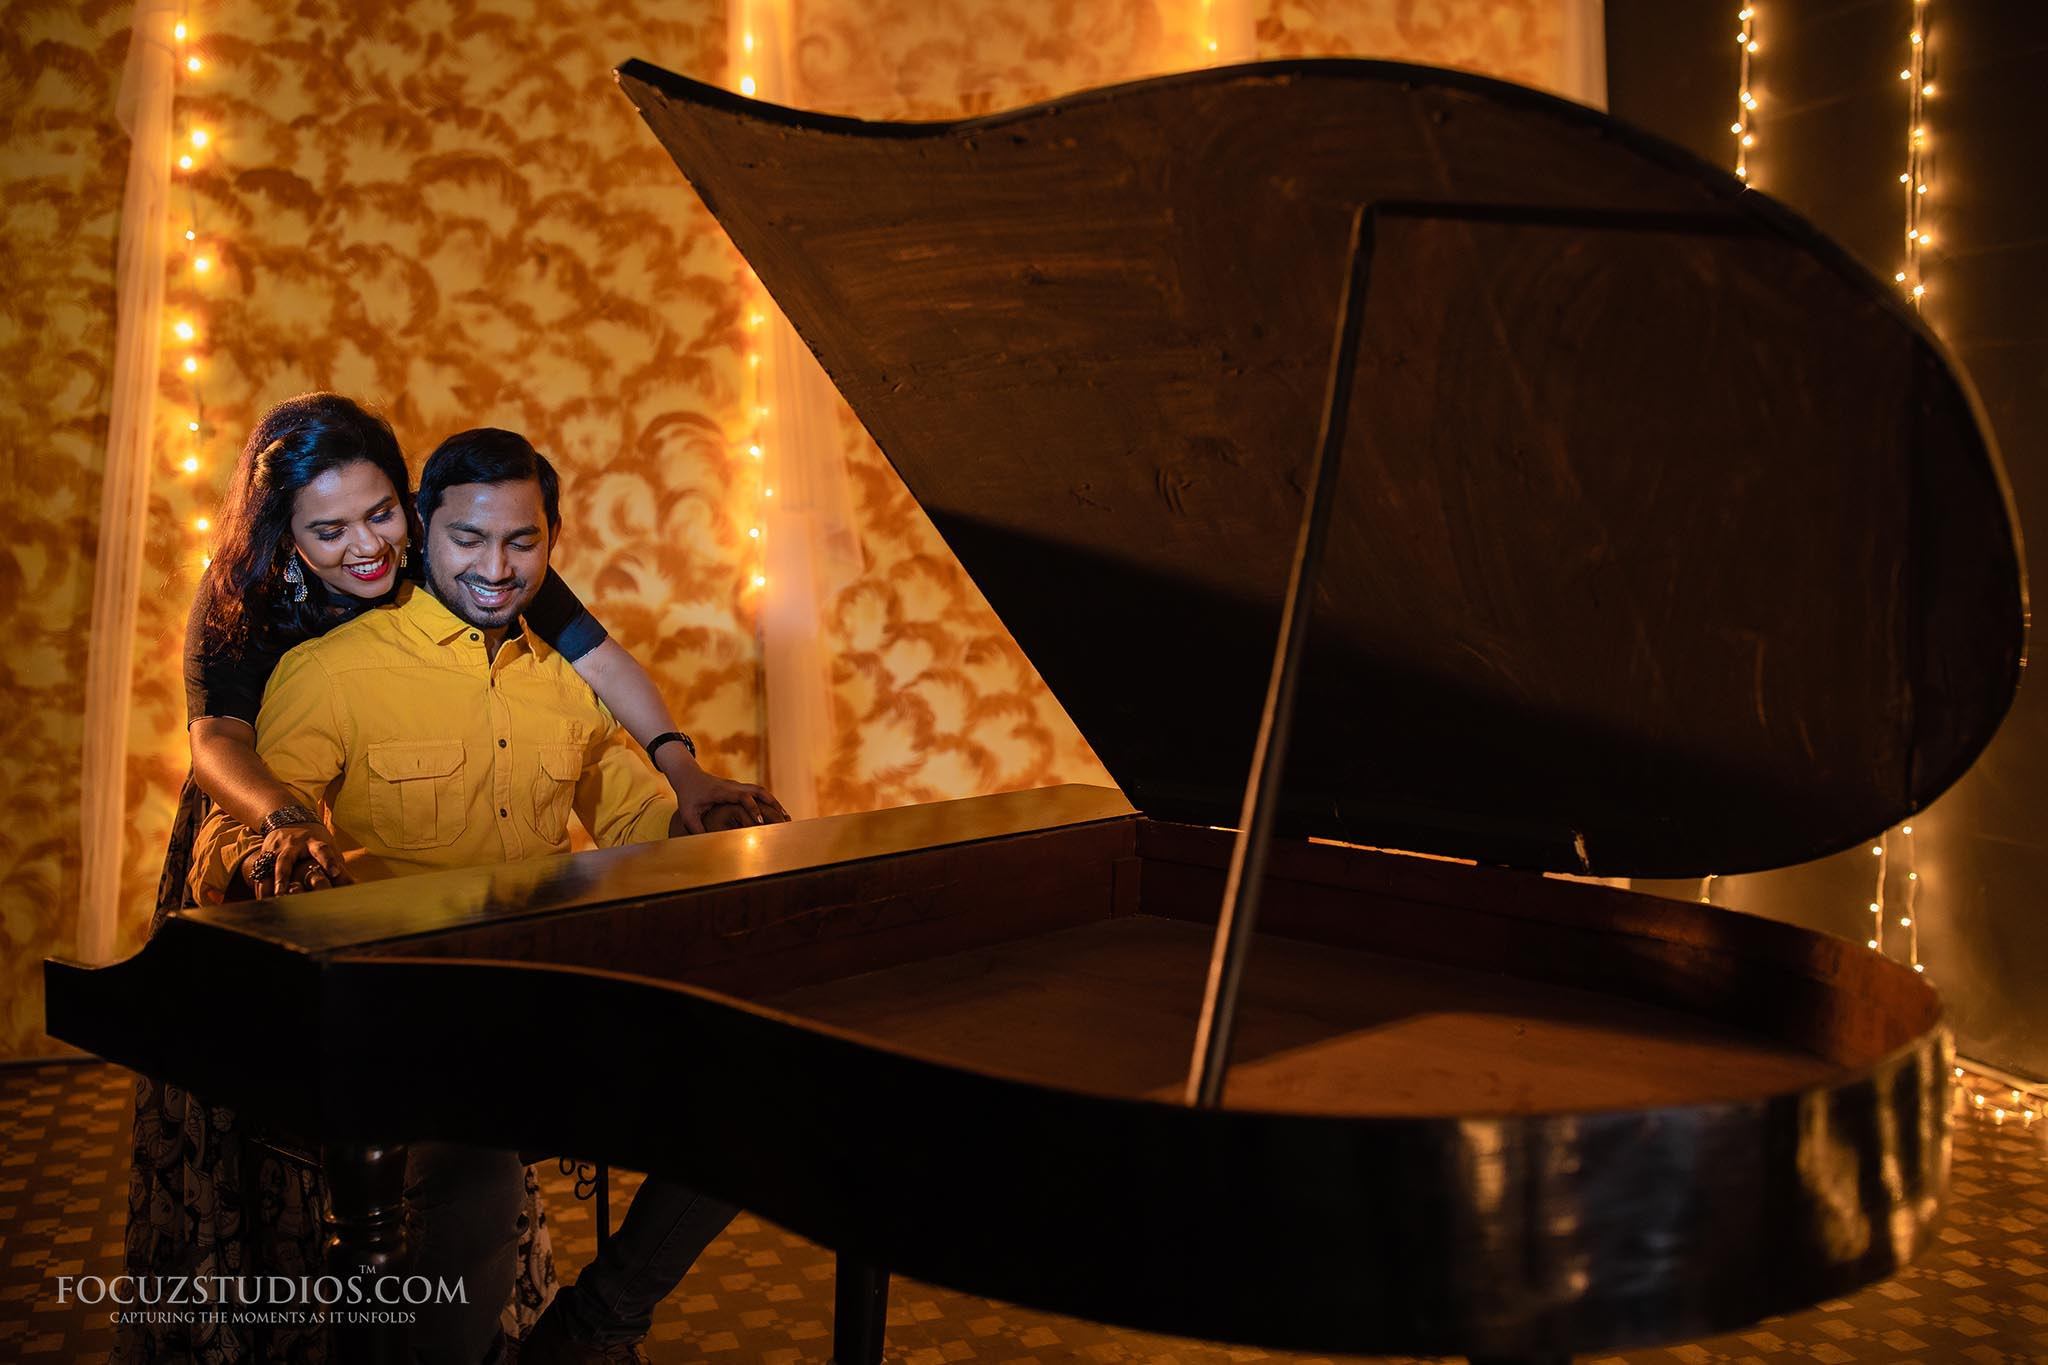 PicturesQ-Studio-focuz-studio-hyderabad-pre-wedding-shoot-2